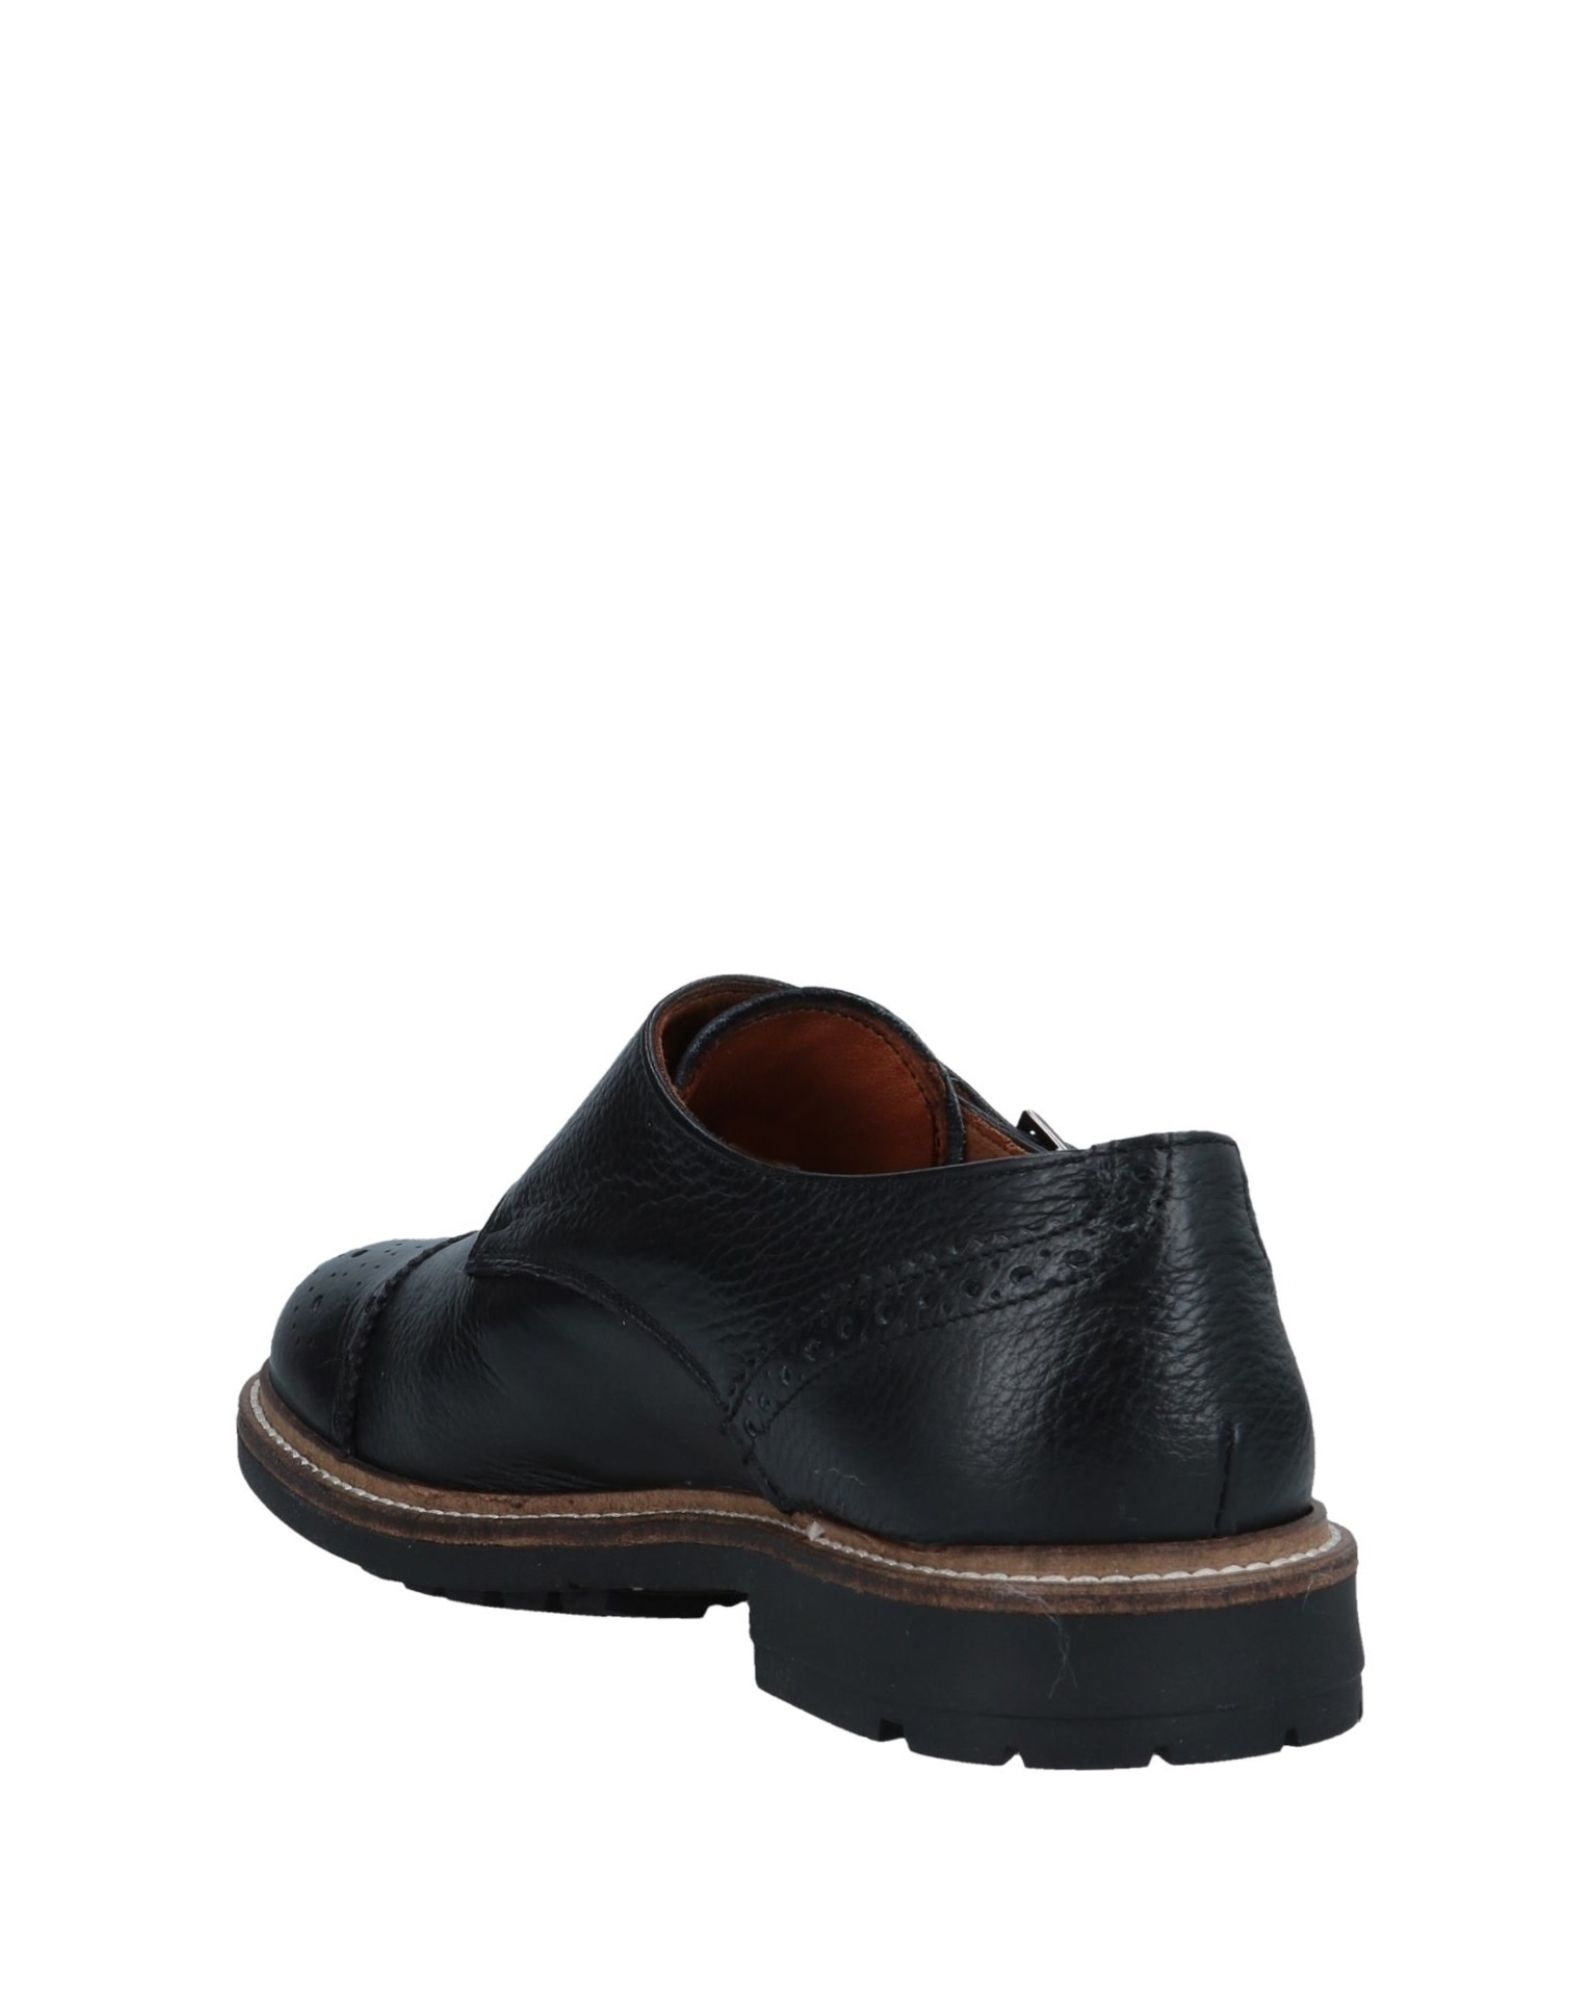 Cristiano Bizzarri Mokassins Herren  Schuhe 11549945FJ Gute Qualität beliebte Schuhe  66cac0